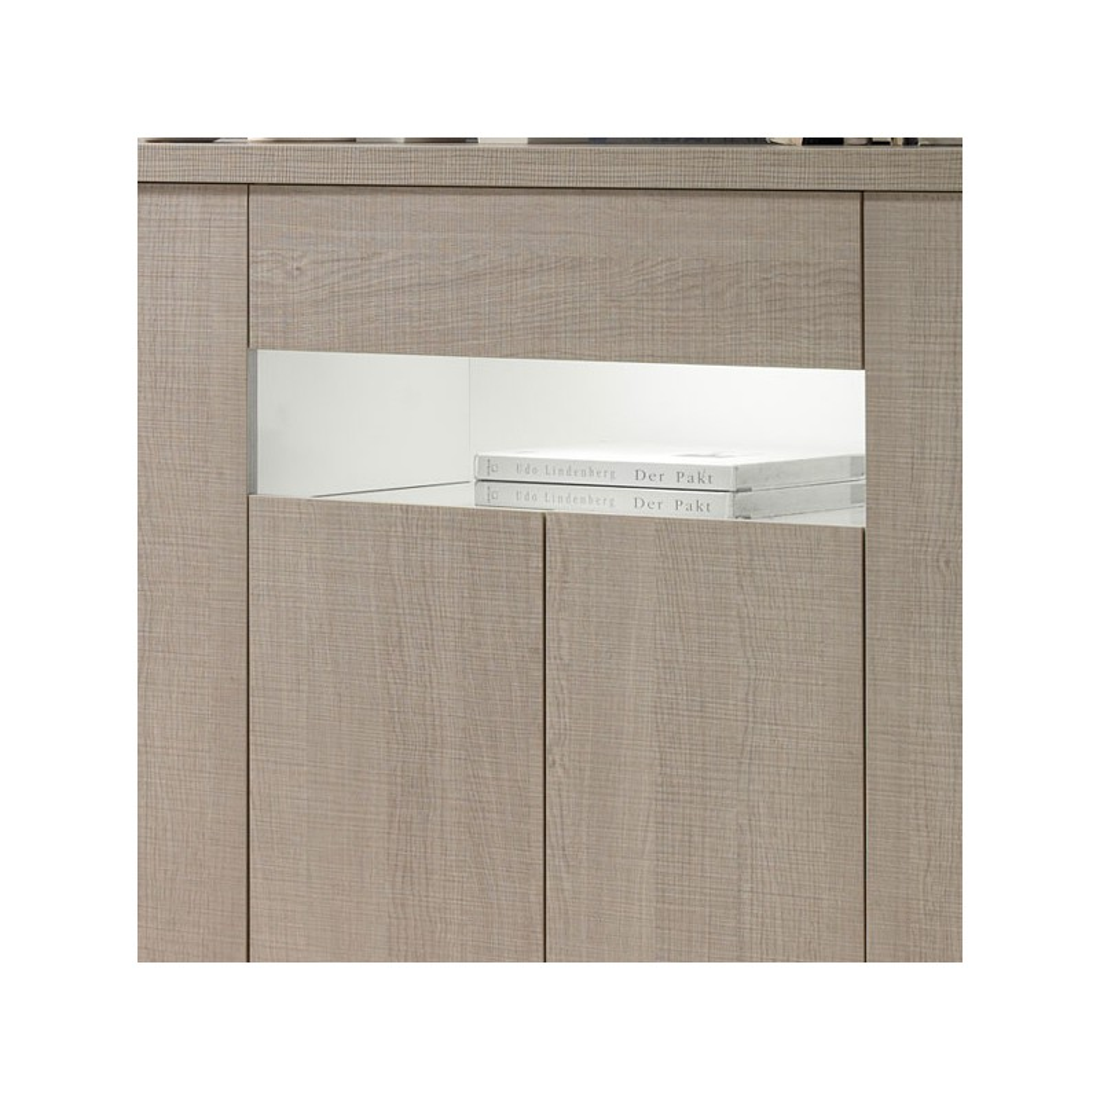 Buffet 4 portes 1 tiroir ch ne clair botekia salle manger mesmeubles - Buffet en chene clair ...